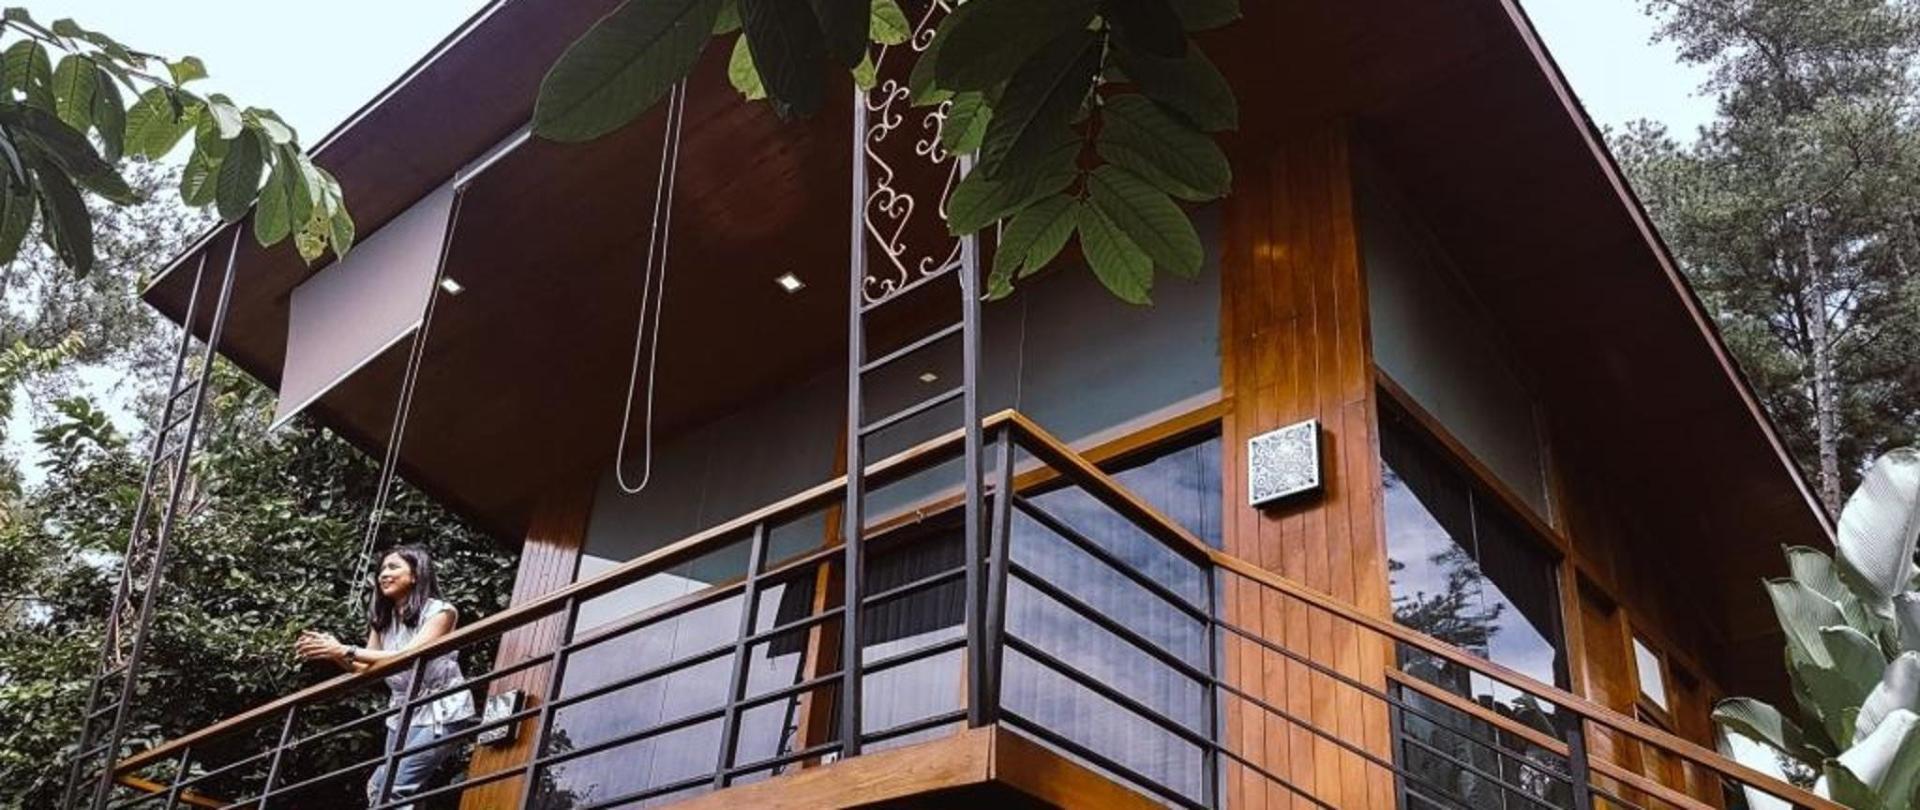 dagi abhinaya balcony.jpg